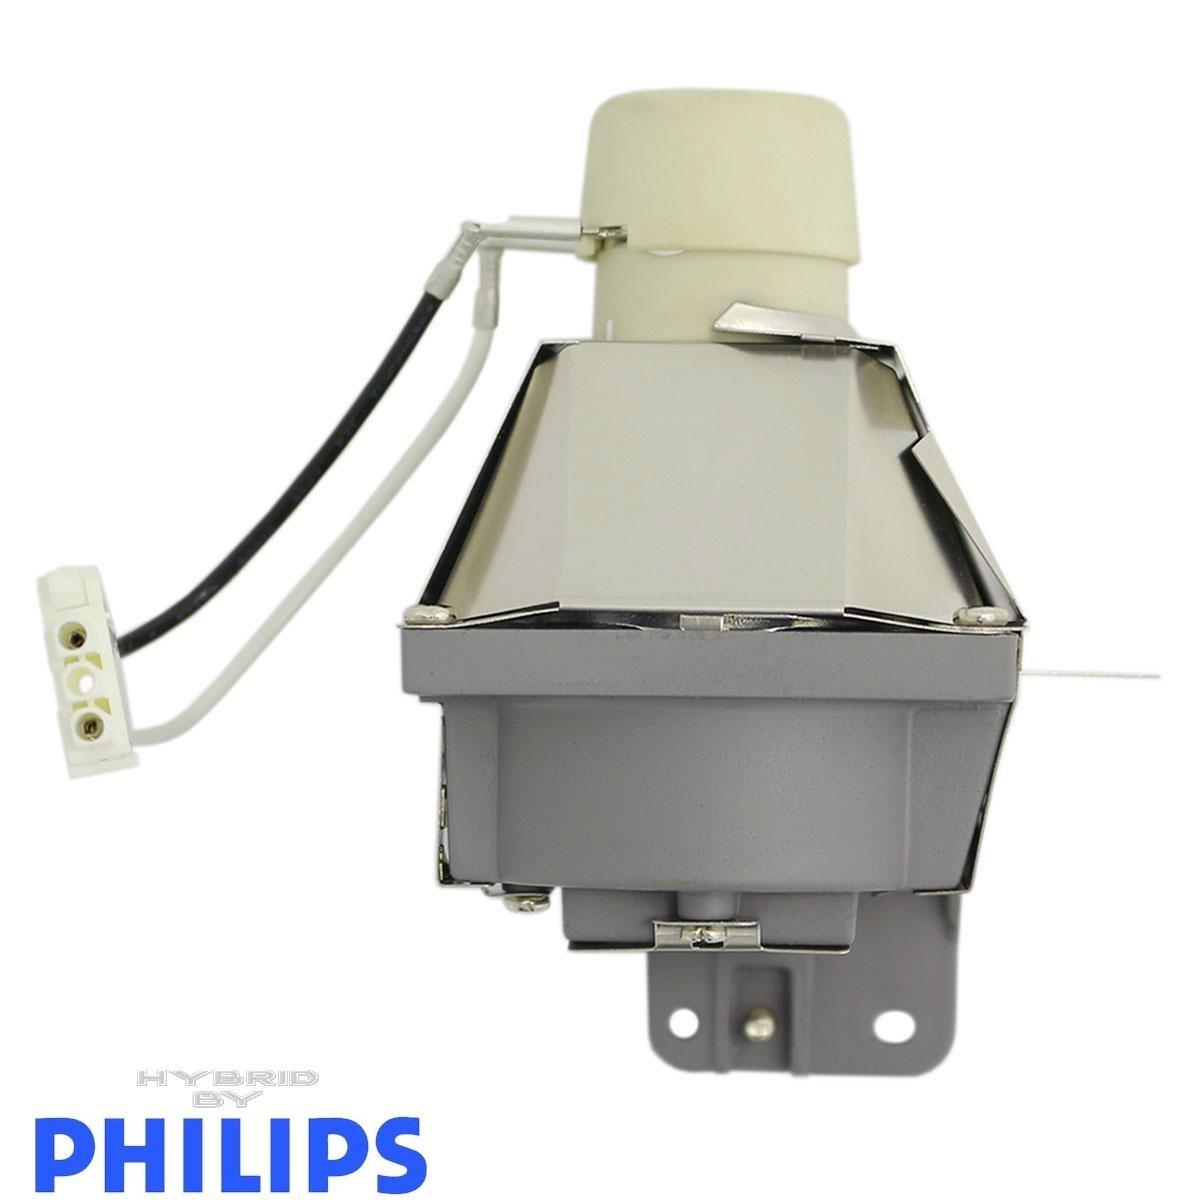 BENQ 5J.JC205.001 - Lamp for BenQ Projector TW523P/MW526/TW526 ...